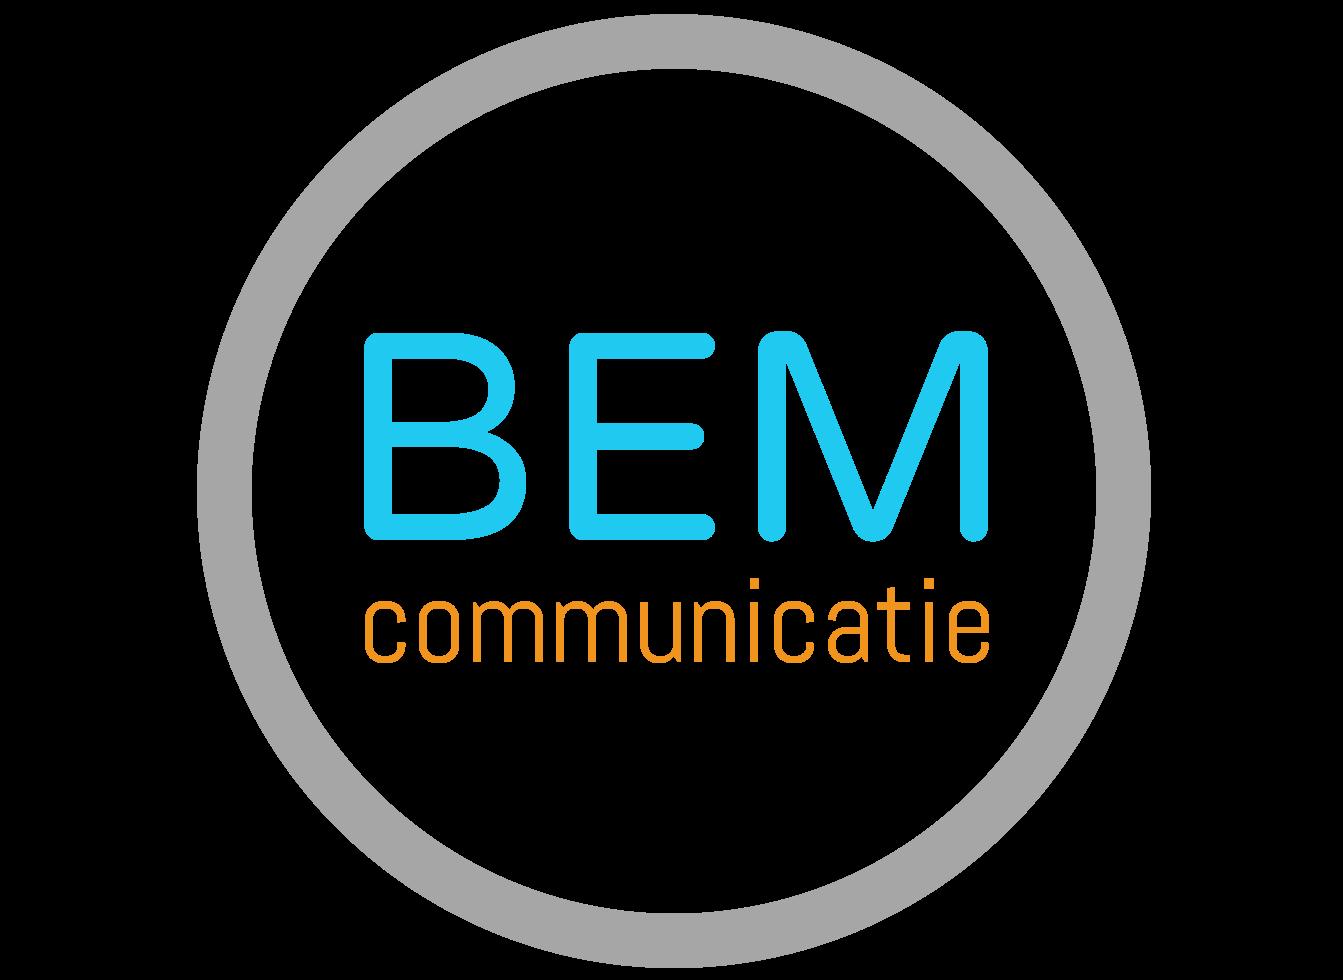 BEM communicatie